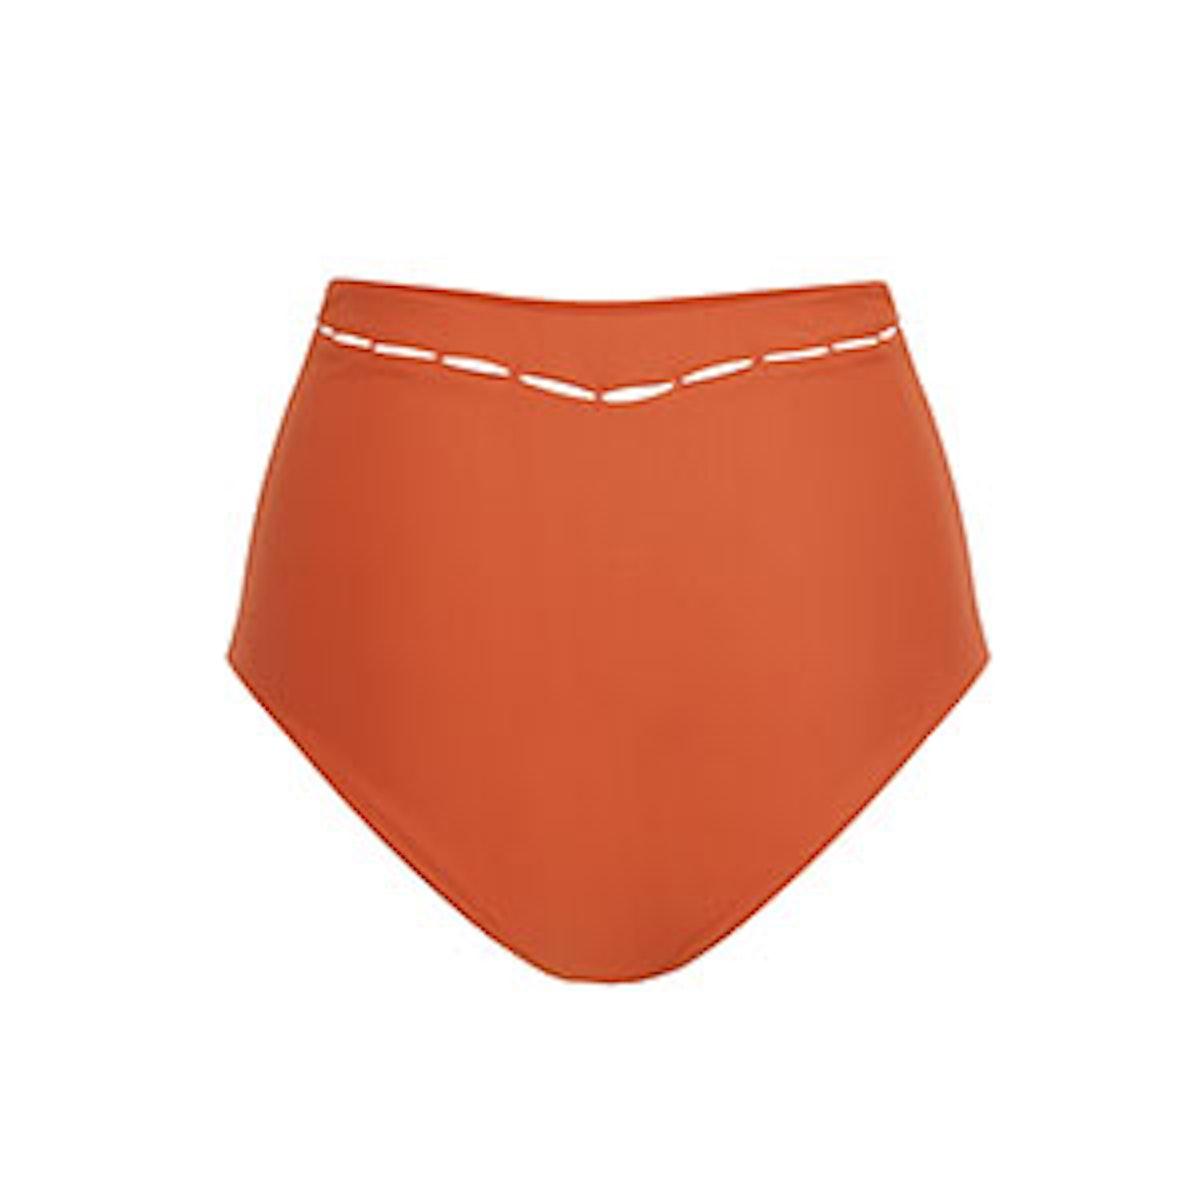 Selby Bikini Bottoms